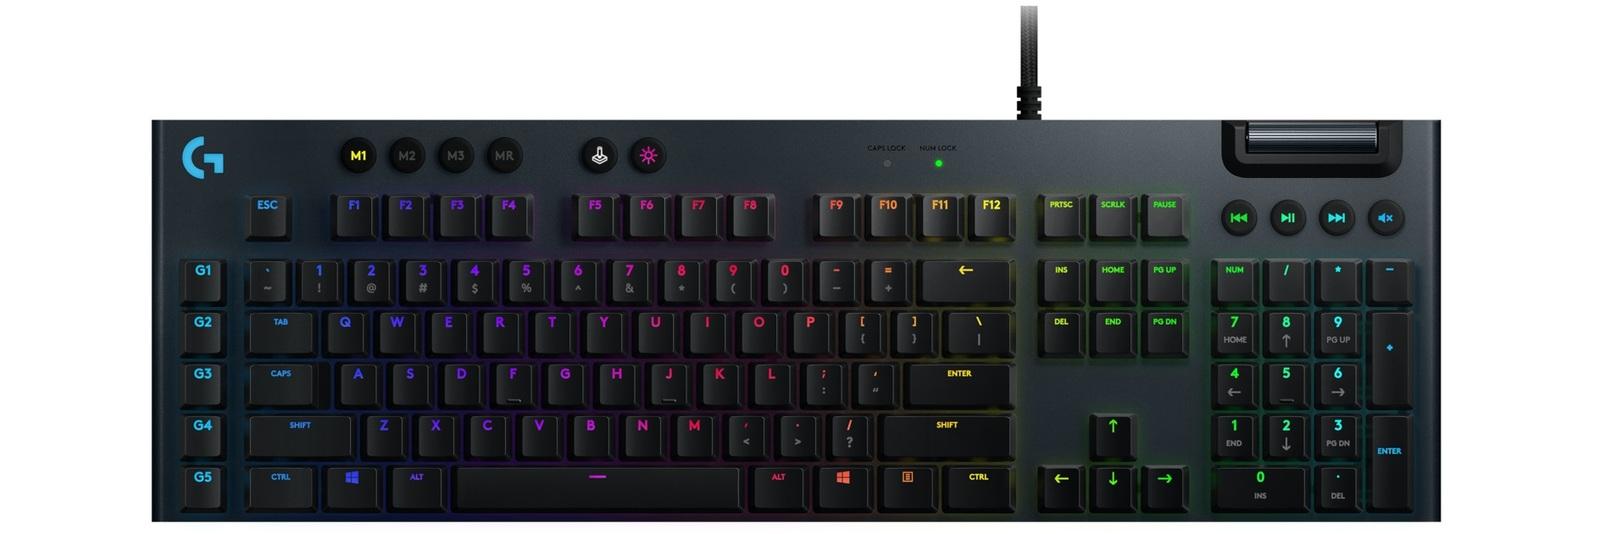 Logitech G815 RGB Mechanical Gaming Keyboard (GL Linear) for PC image